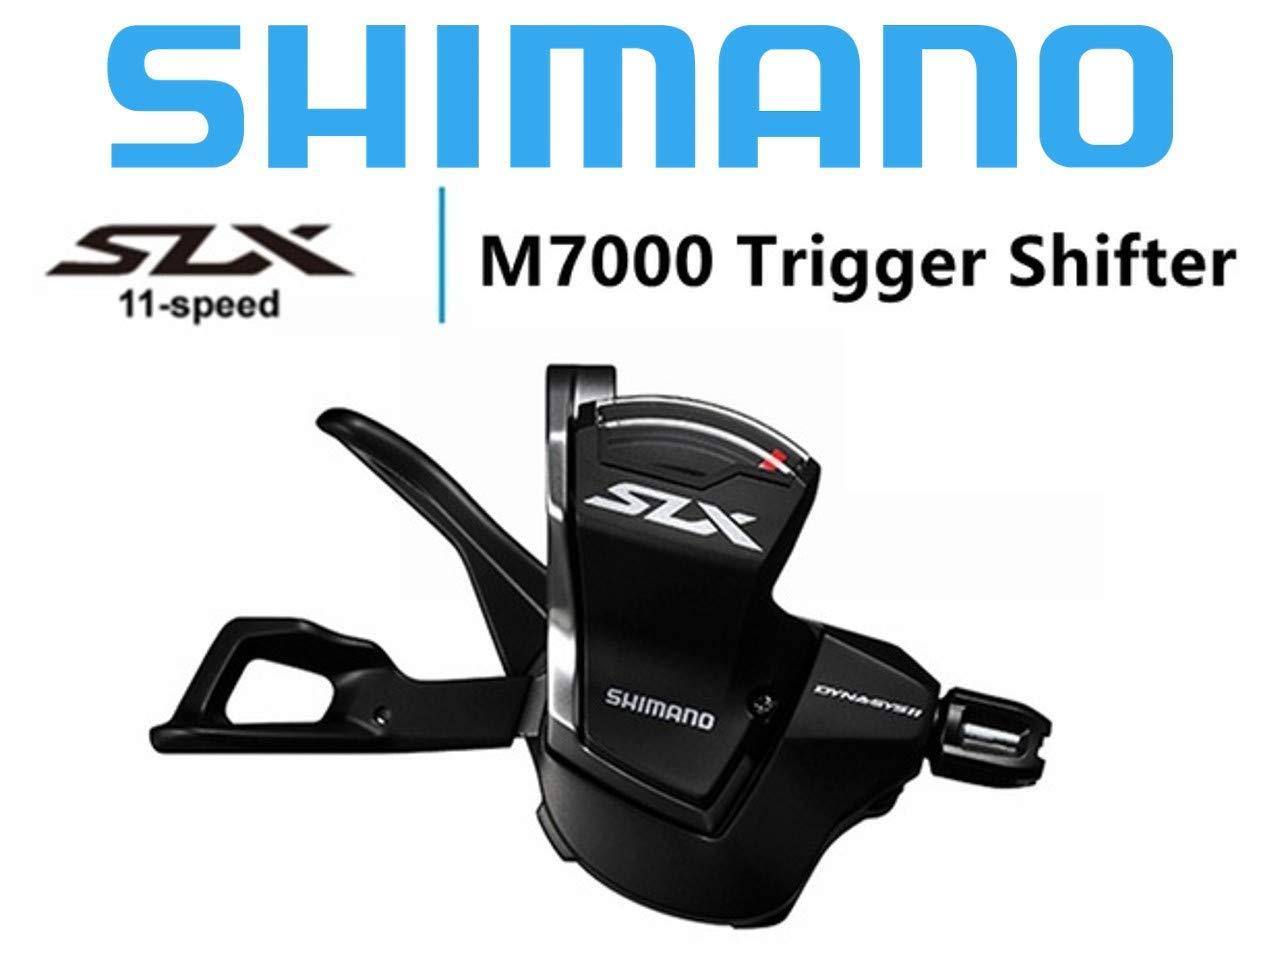 SHIMANO SLX SL-M7000 Trigger Shifter One Color, Right by SHIMANO